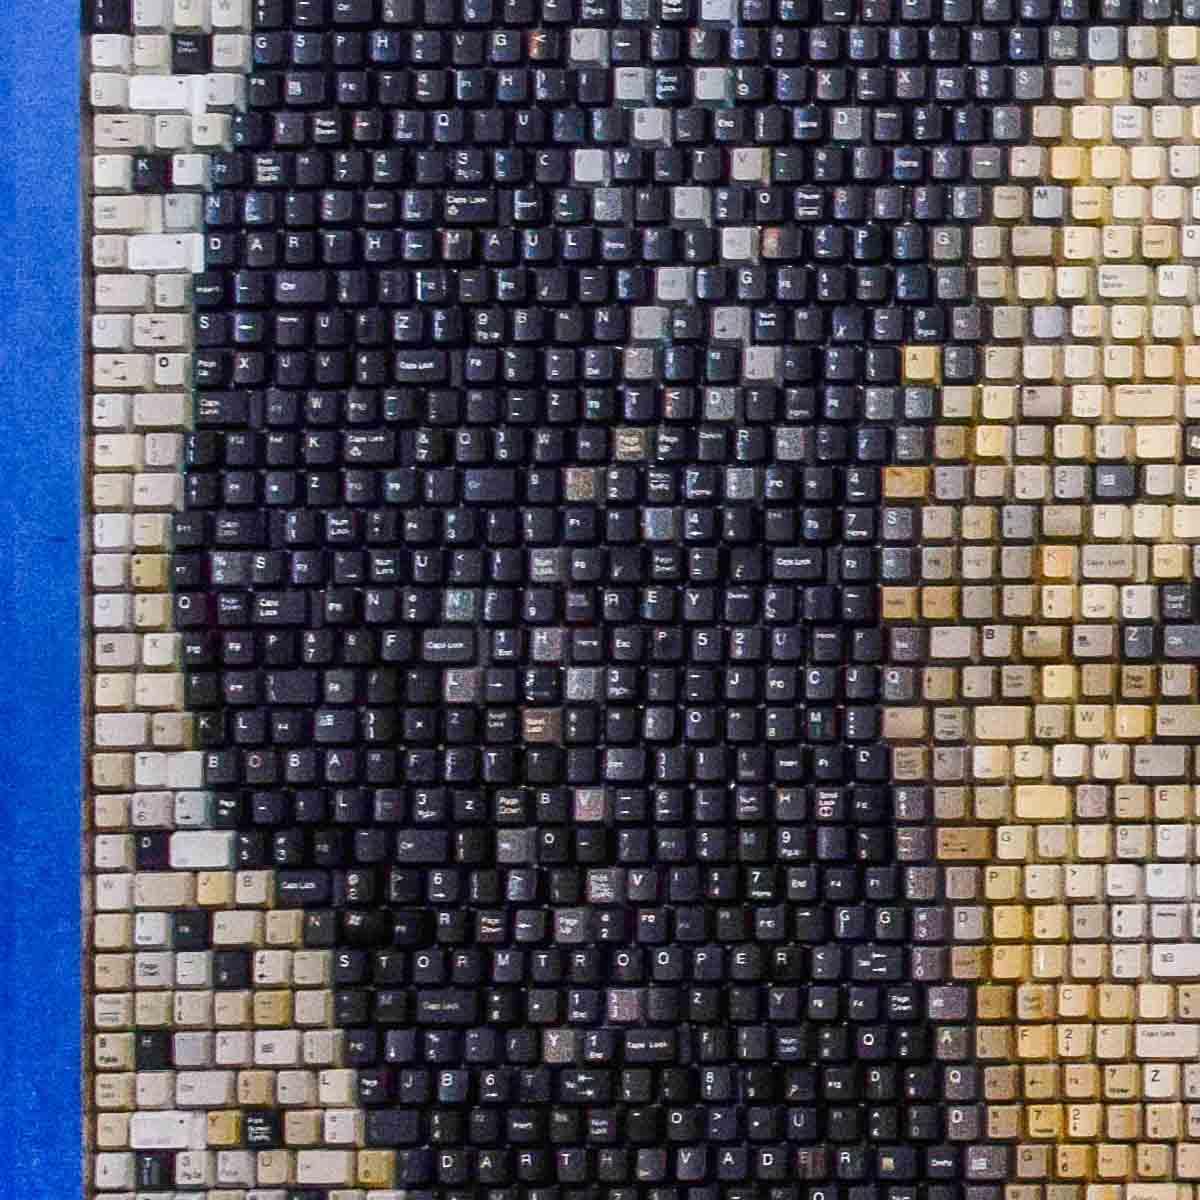 Princess Leia keyboard portrait